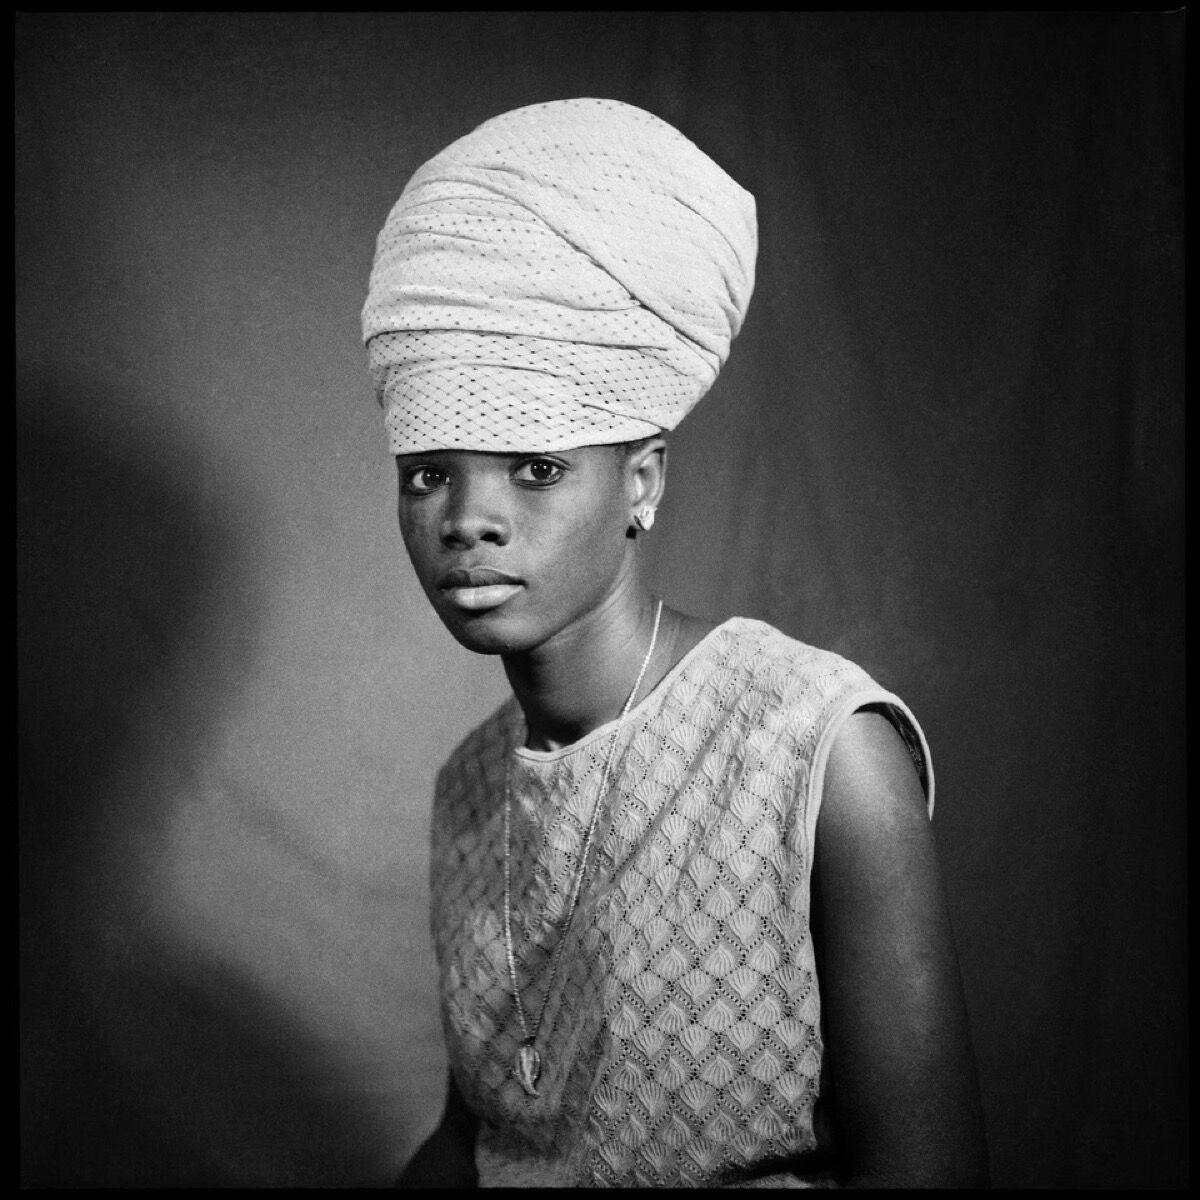 Sory Sanlé, photo from Sory Sanlé - Volta Photo 1965-1985. Courtesy of Reel Art Press.